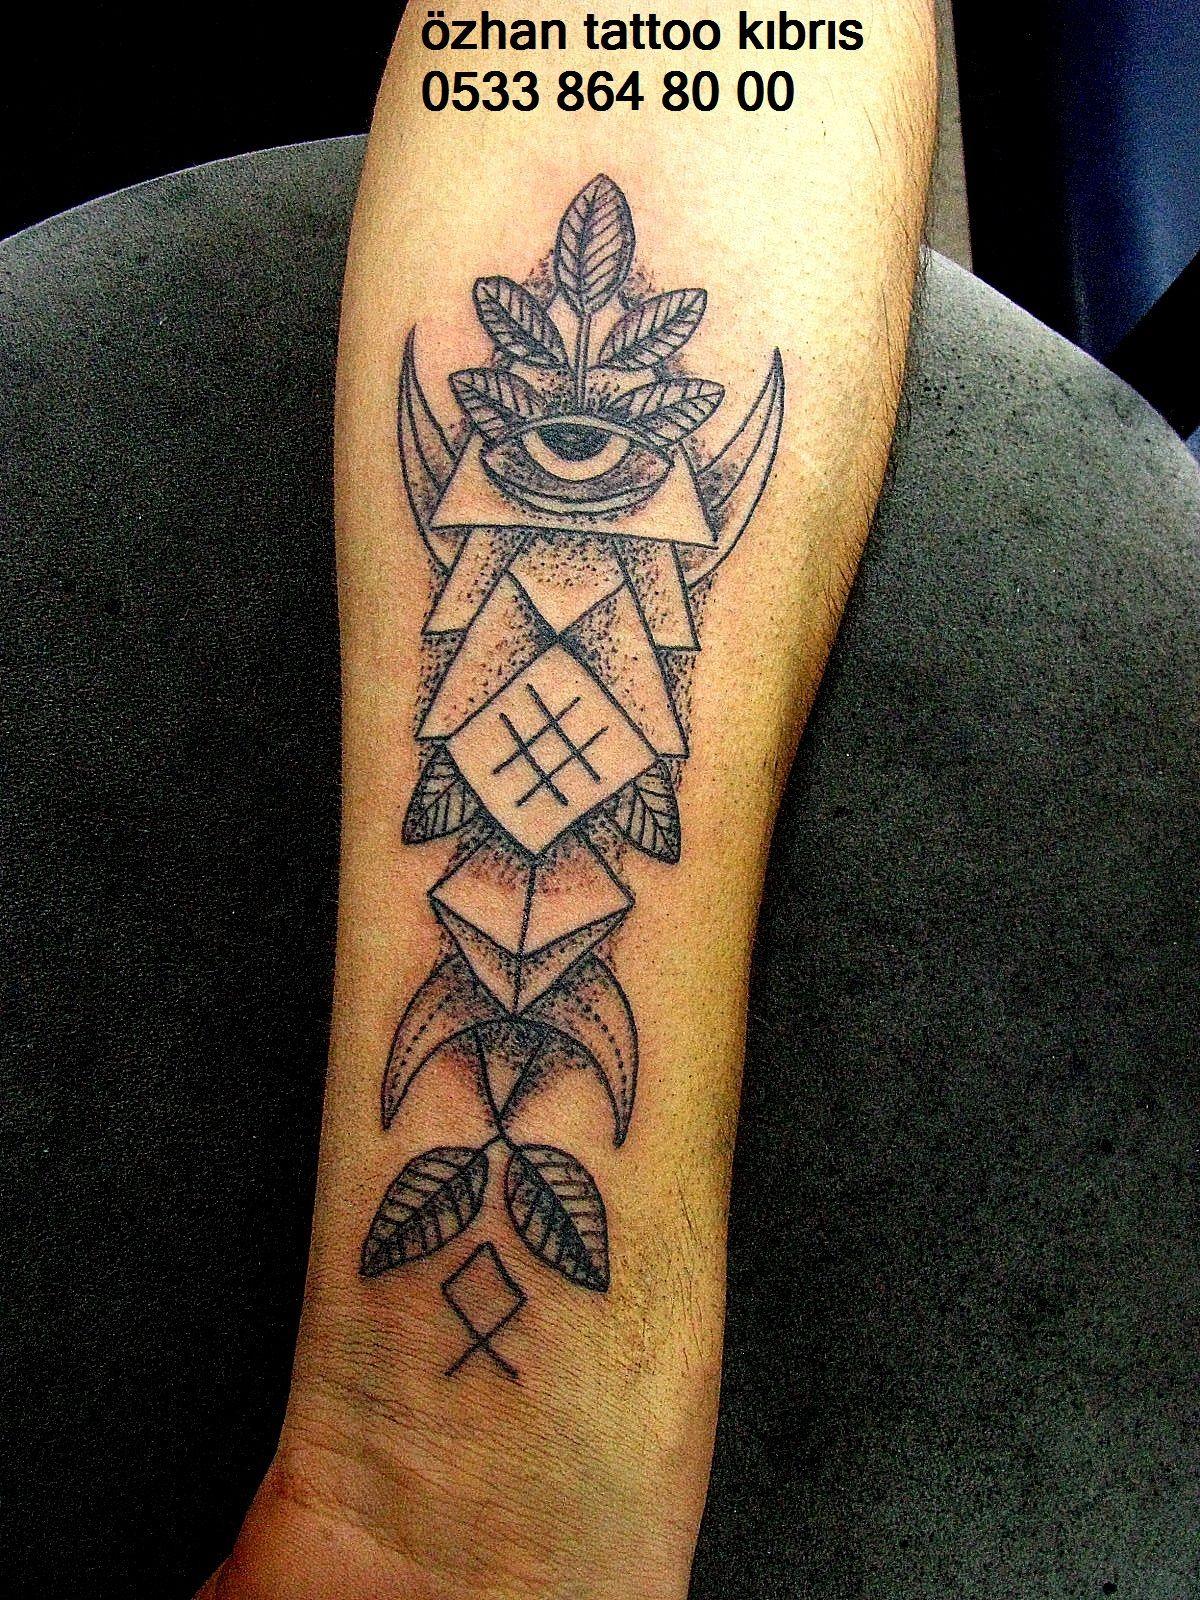 Dovme Kibris Tattoo Cyprus Cyprus Tattoo Nicosia Tattoo Dovme Modelleri Tattoo Dovme Tattoo Dovme Dovme Fiyatlari Tattoo Dovme Modelleri Dovme Dovme Desenleri